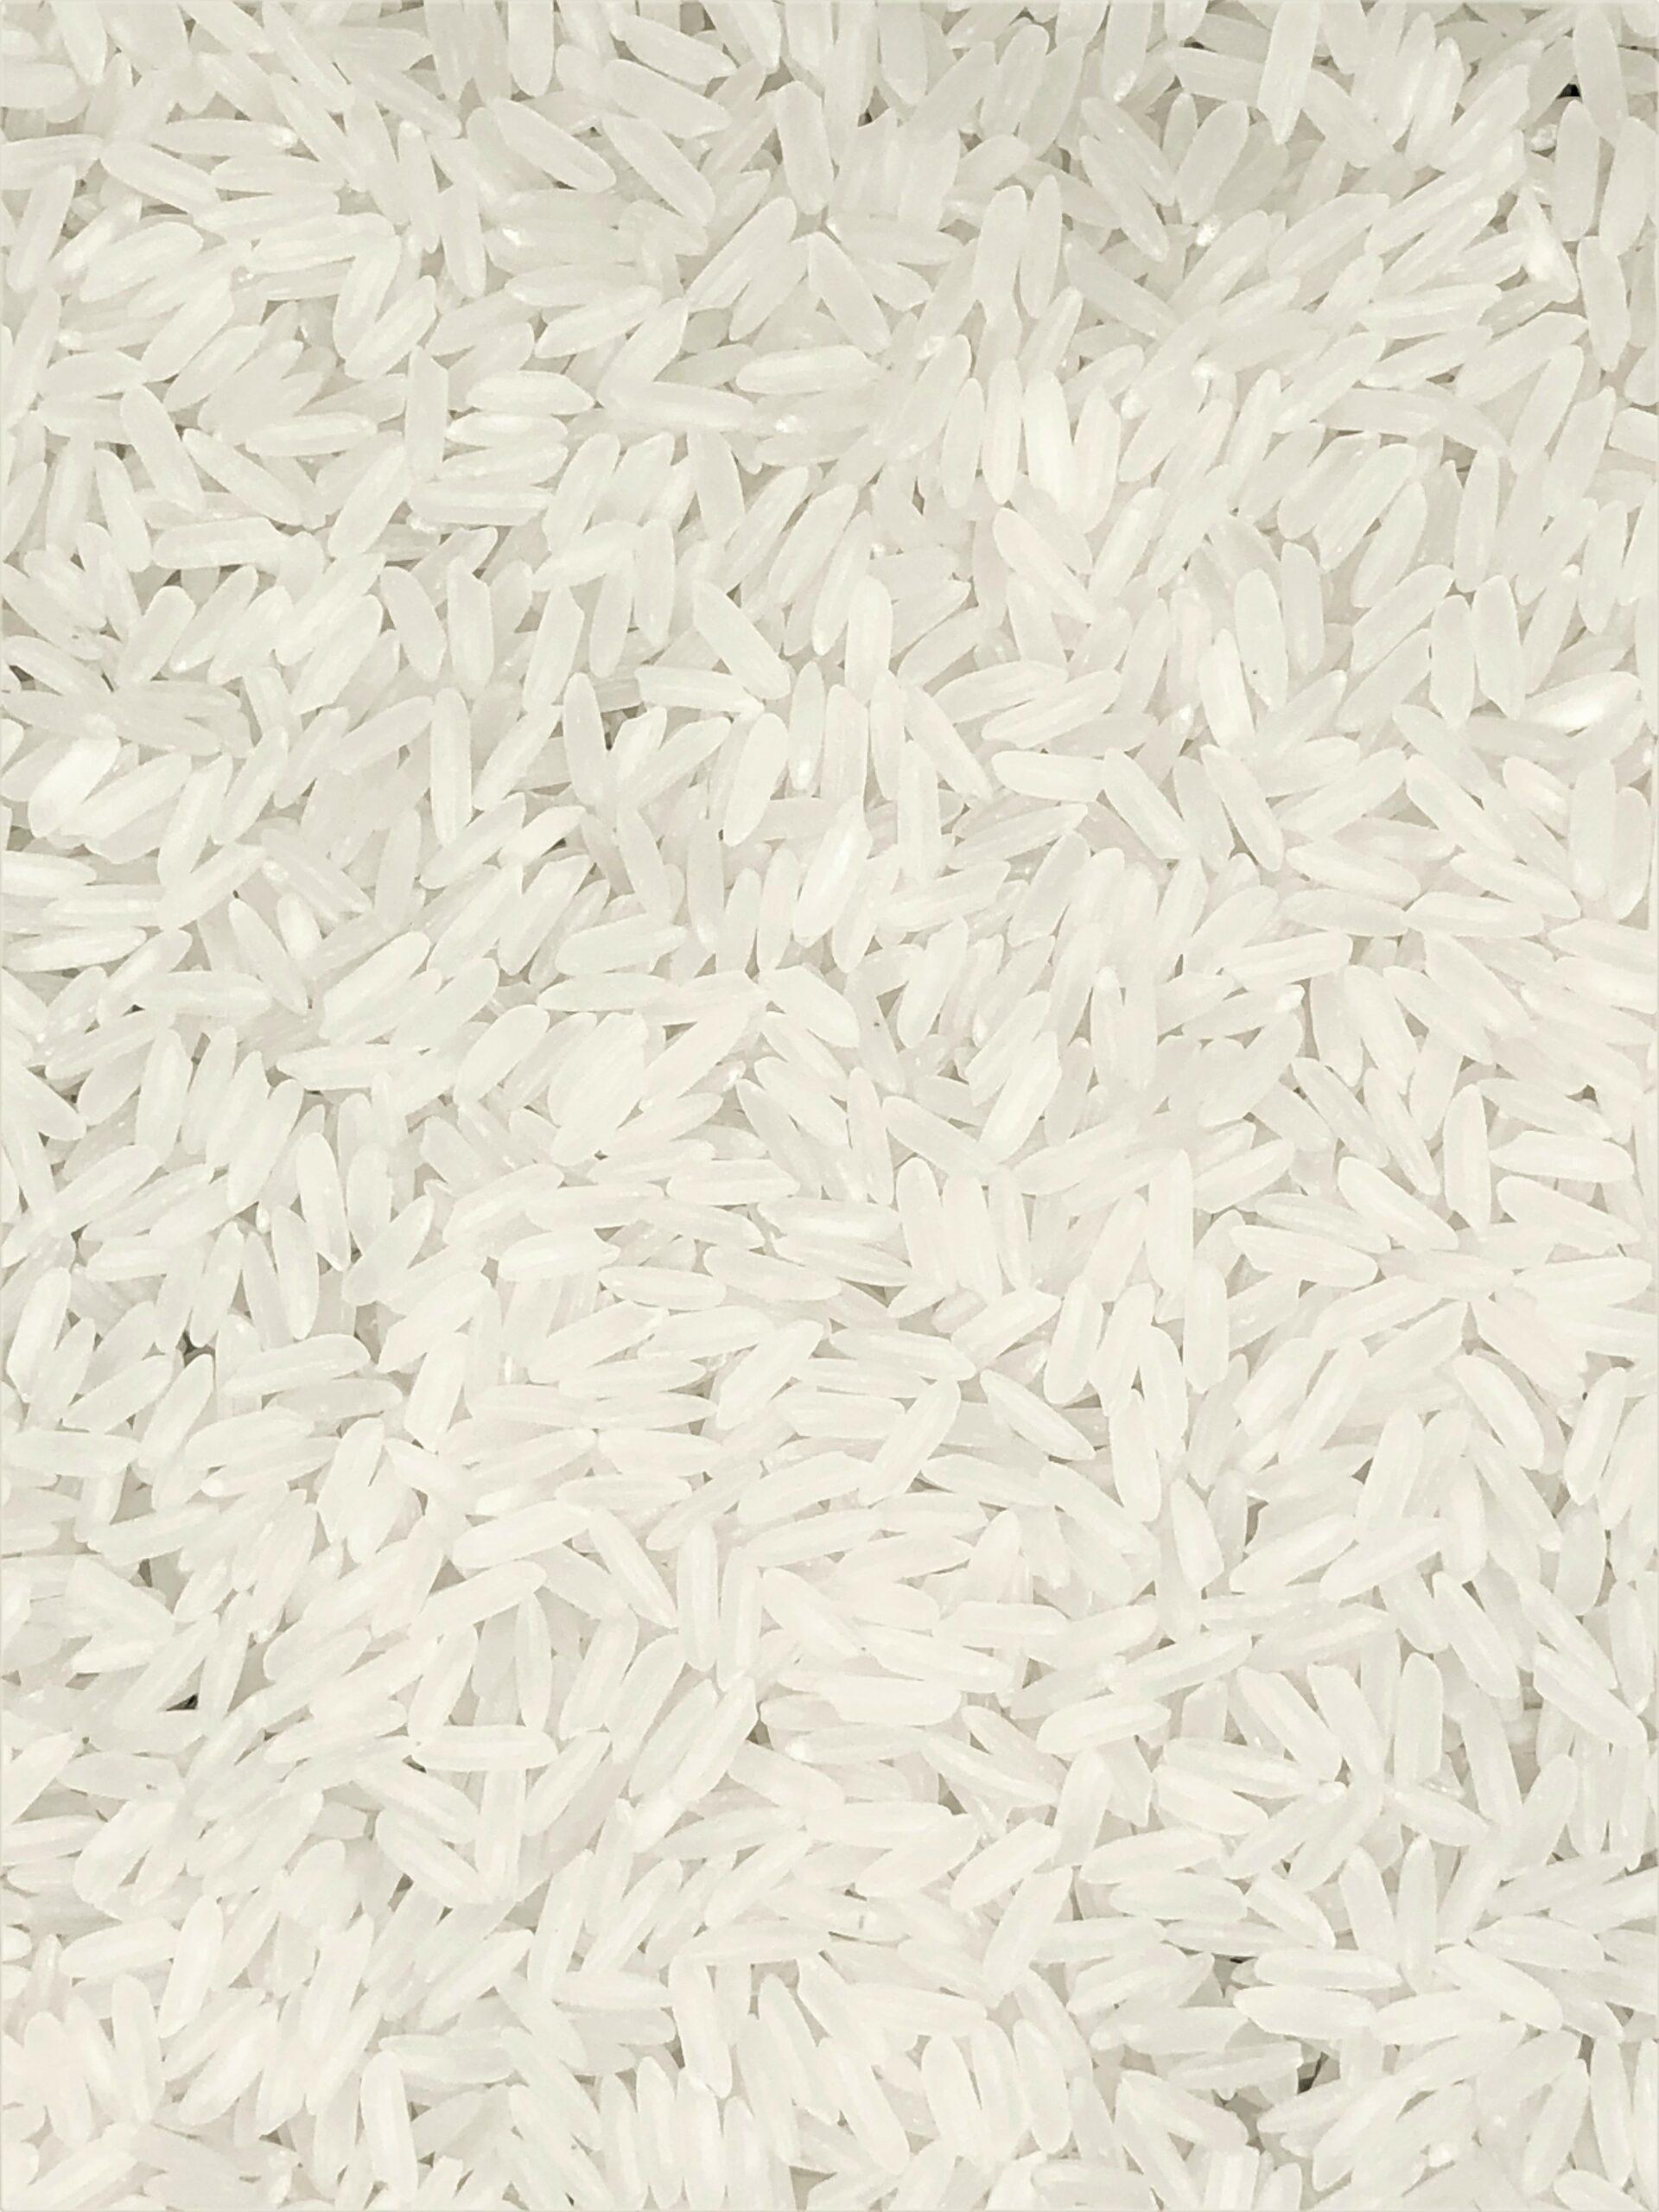 Cambodian White Rice